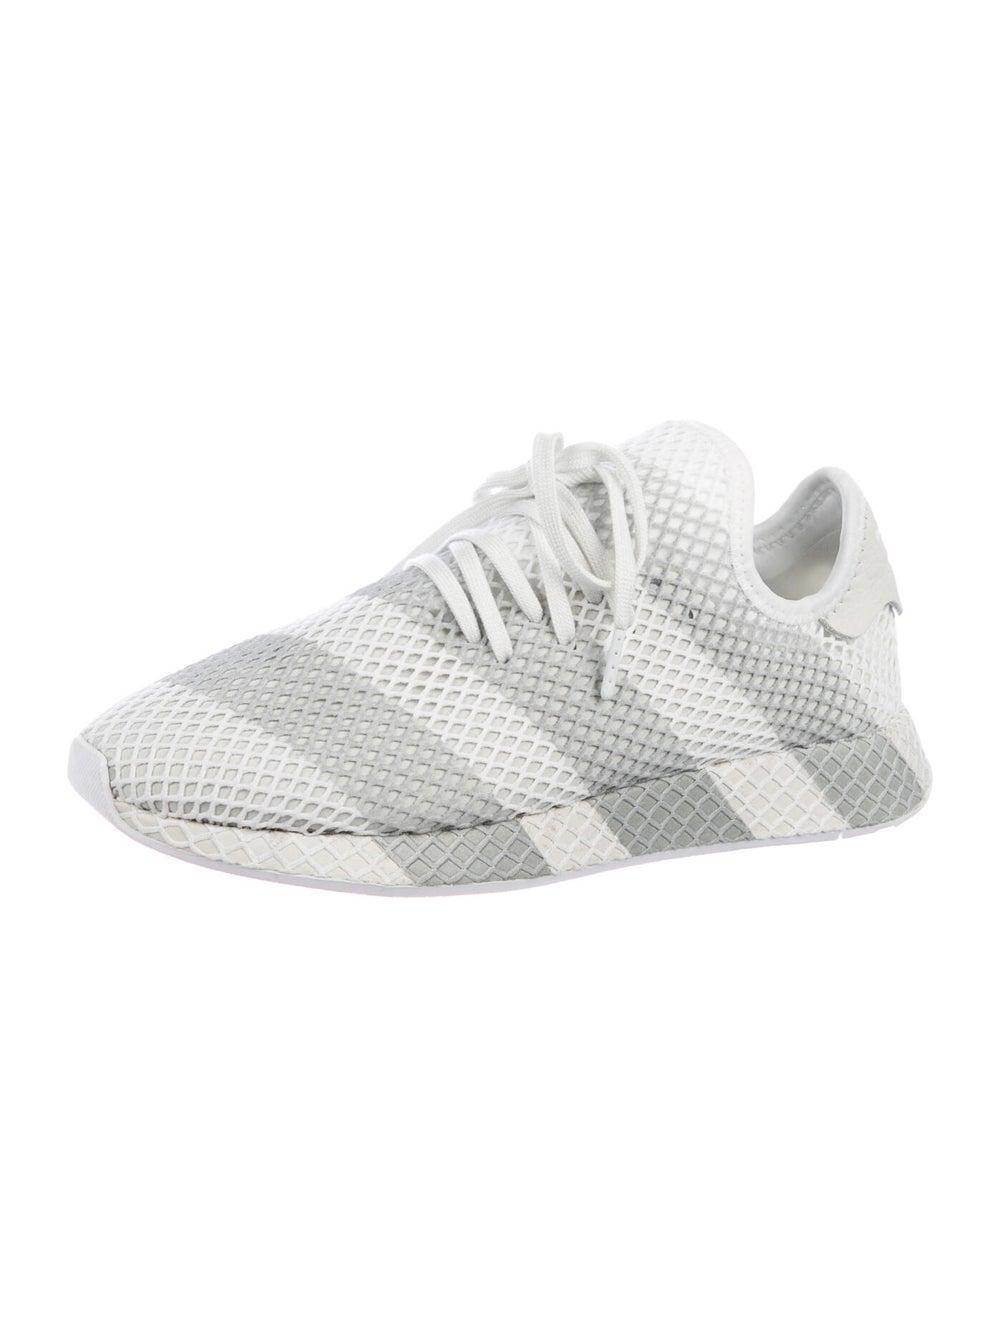 Adidas Deerupt Sneakers White - image 2